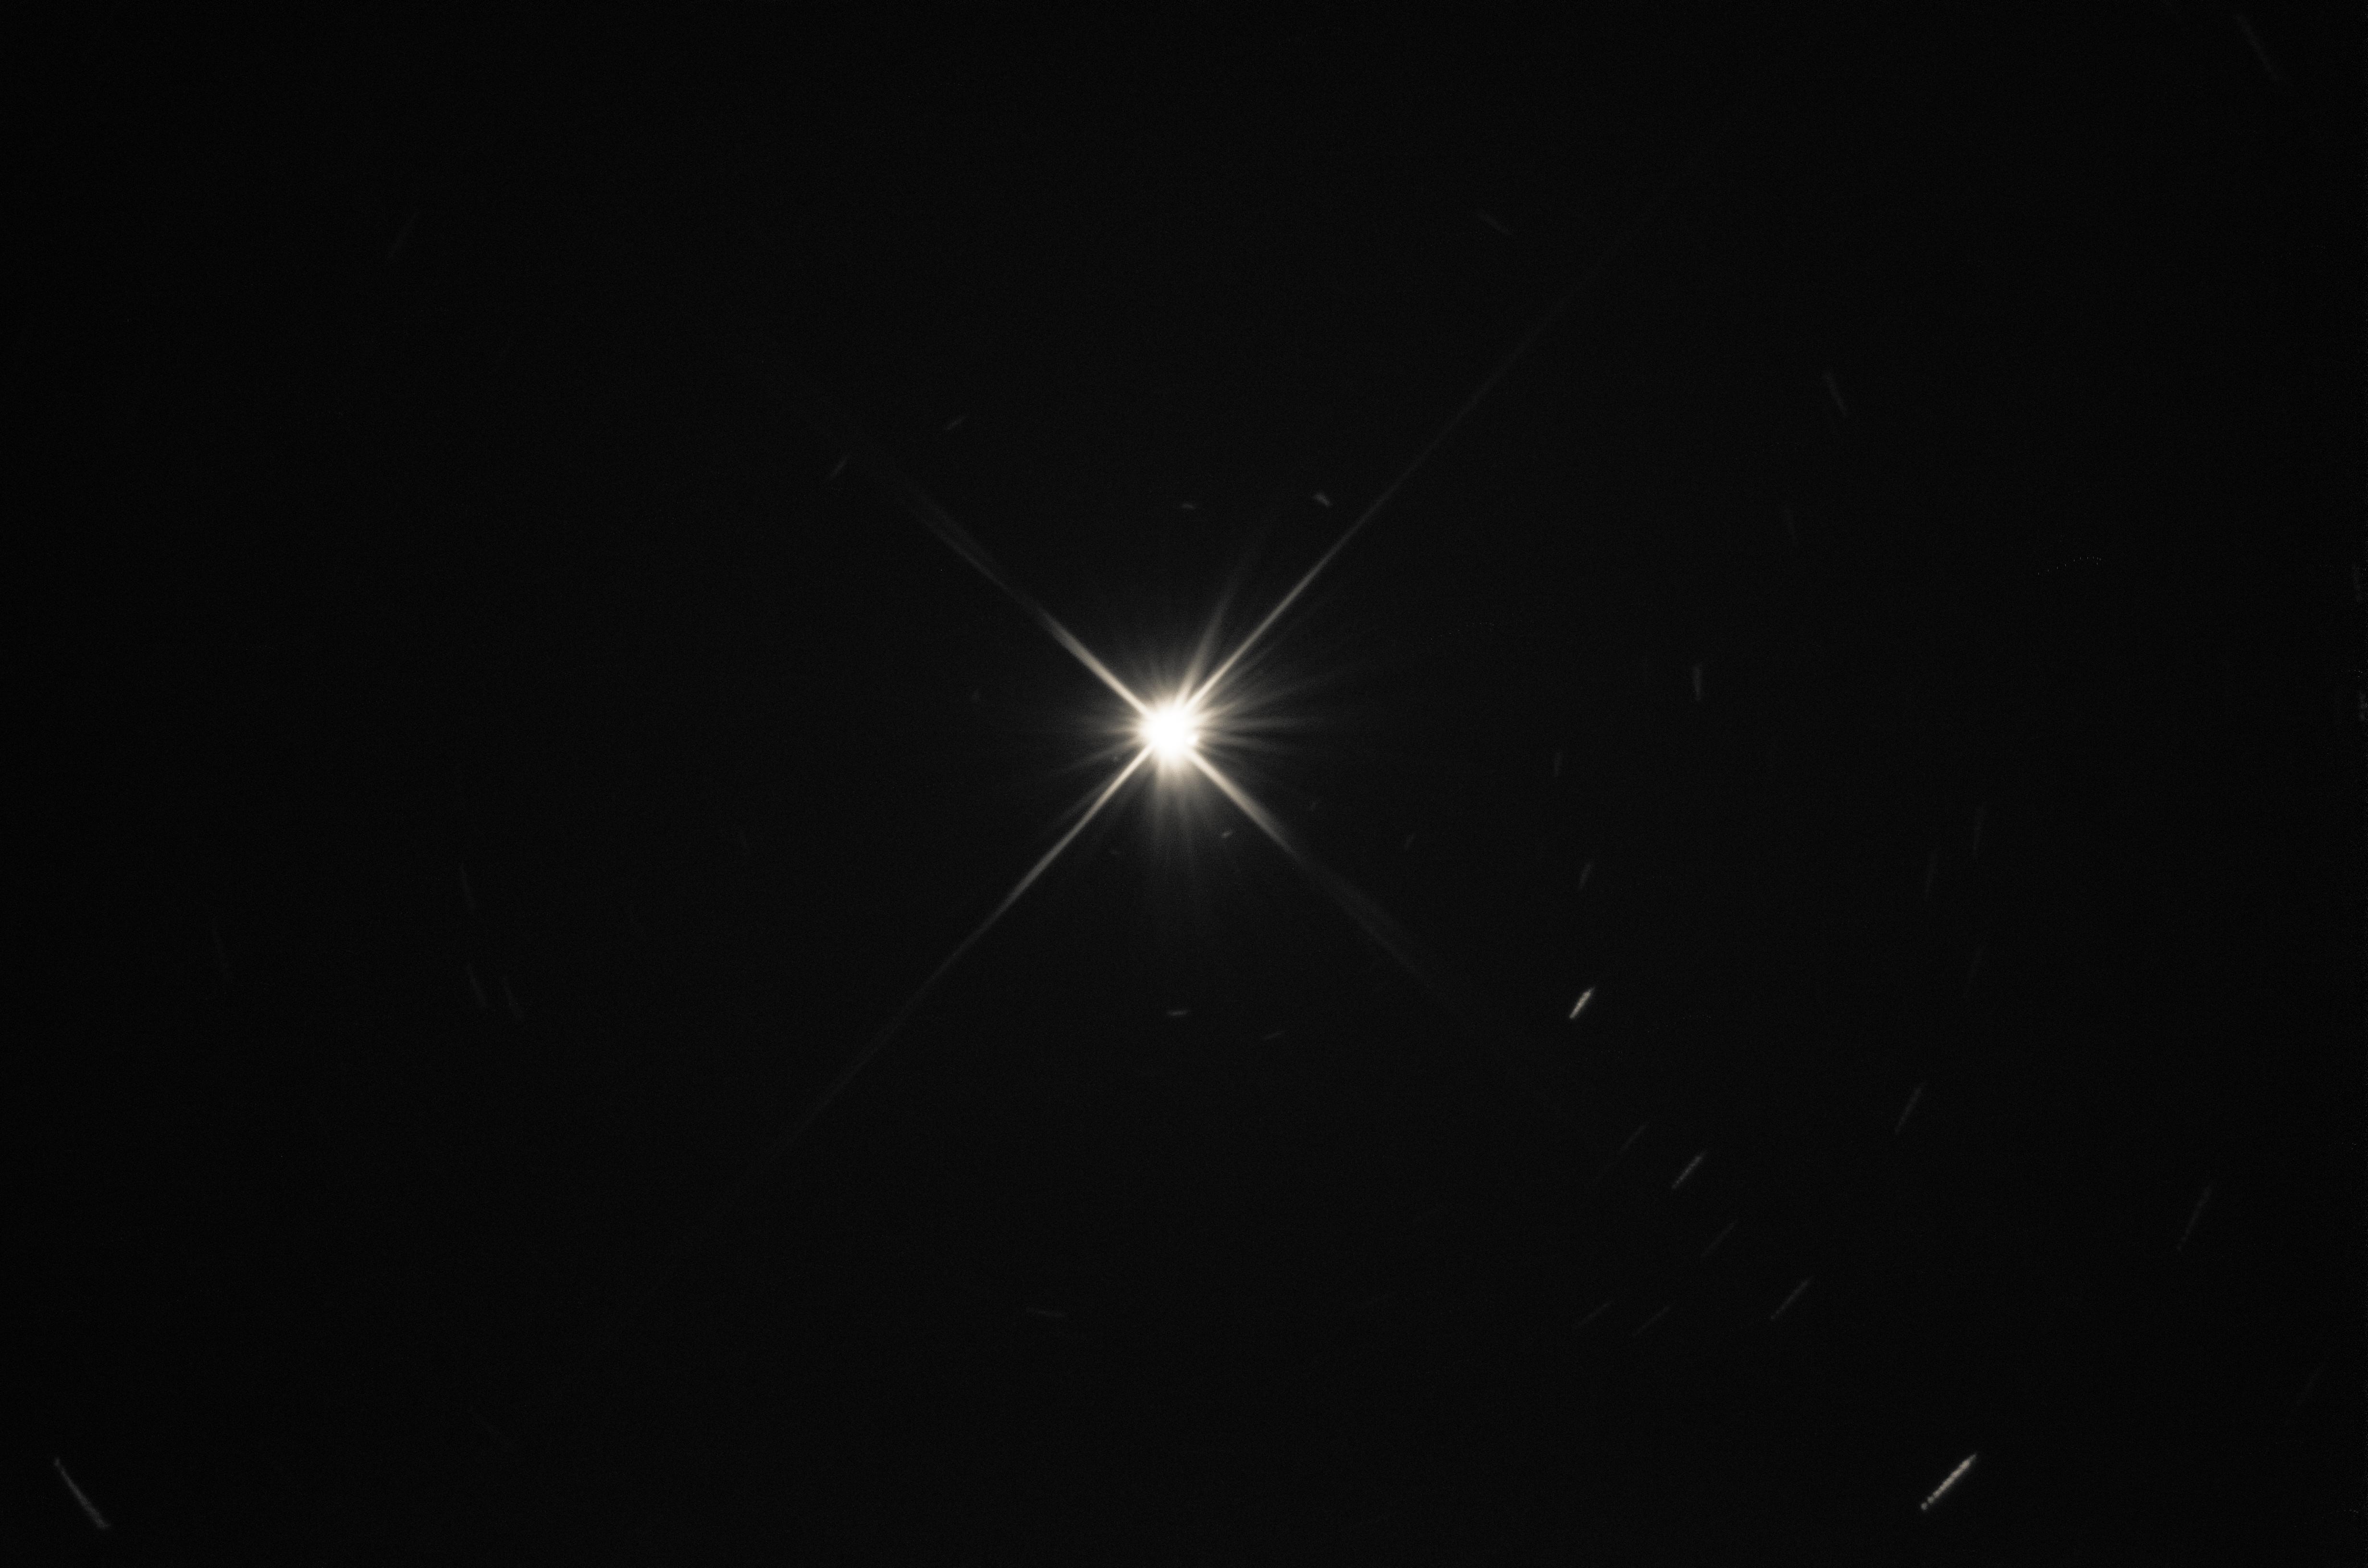 Methods of detecting exoplanets  Wikipedia